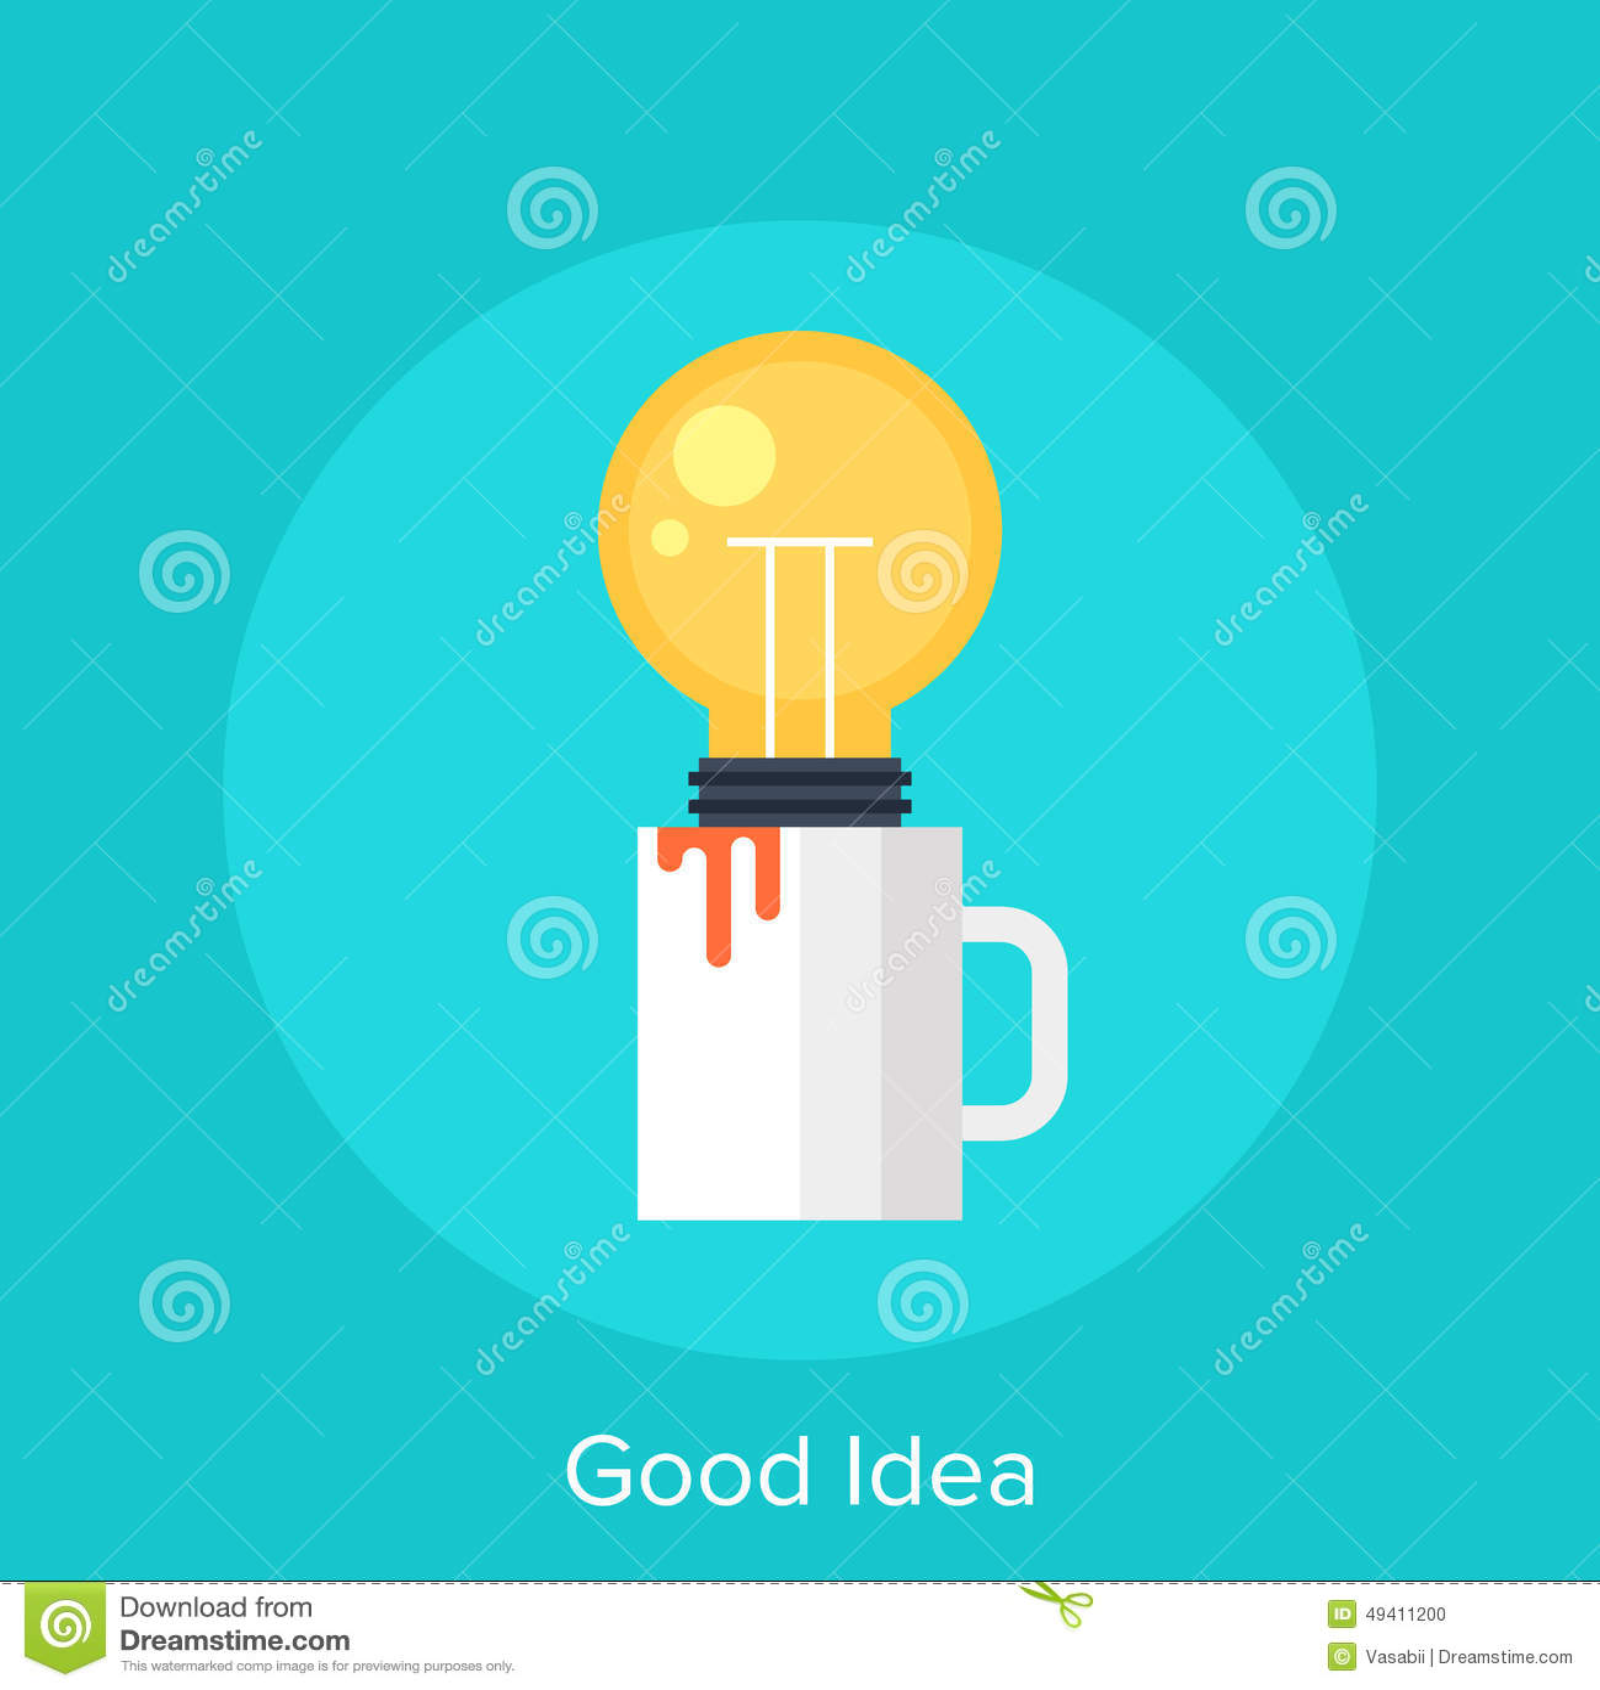 Good Idea Stock Photo Image 49411200